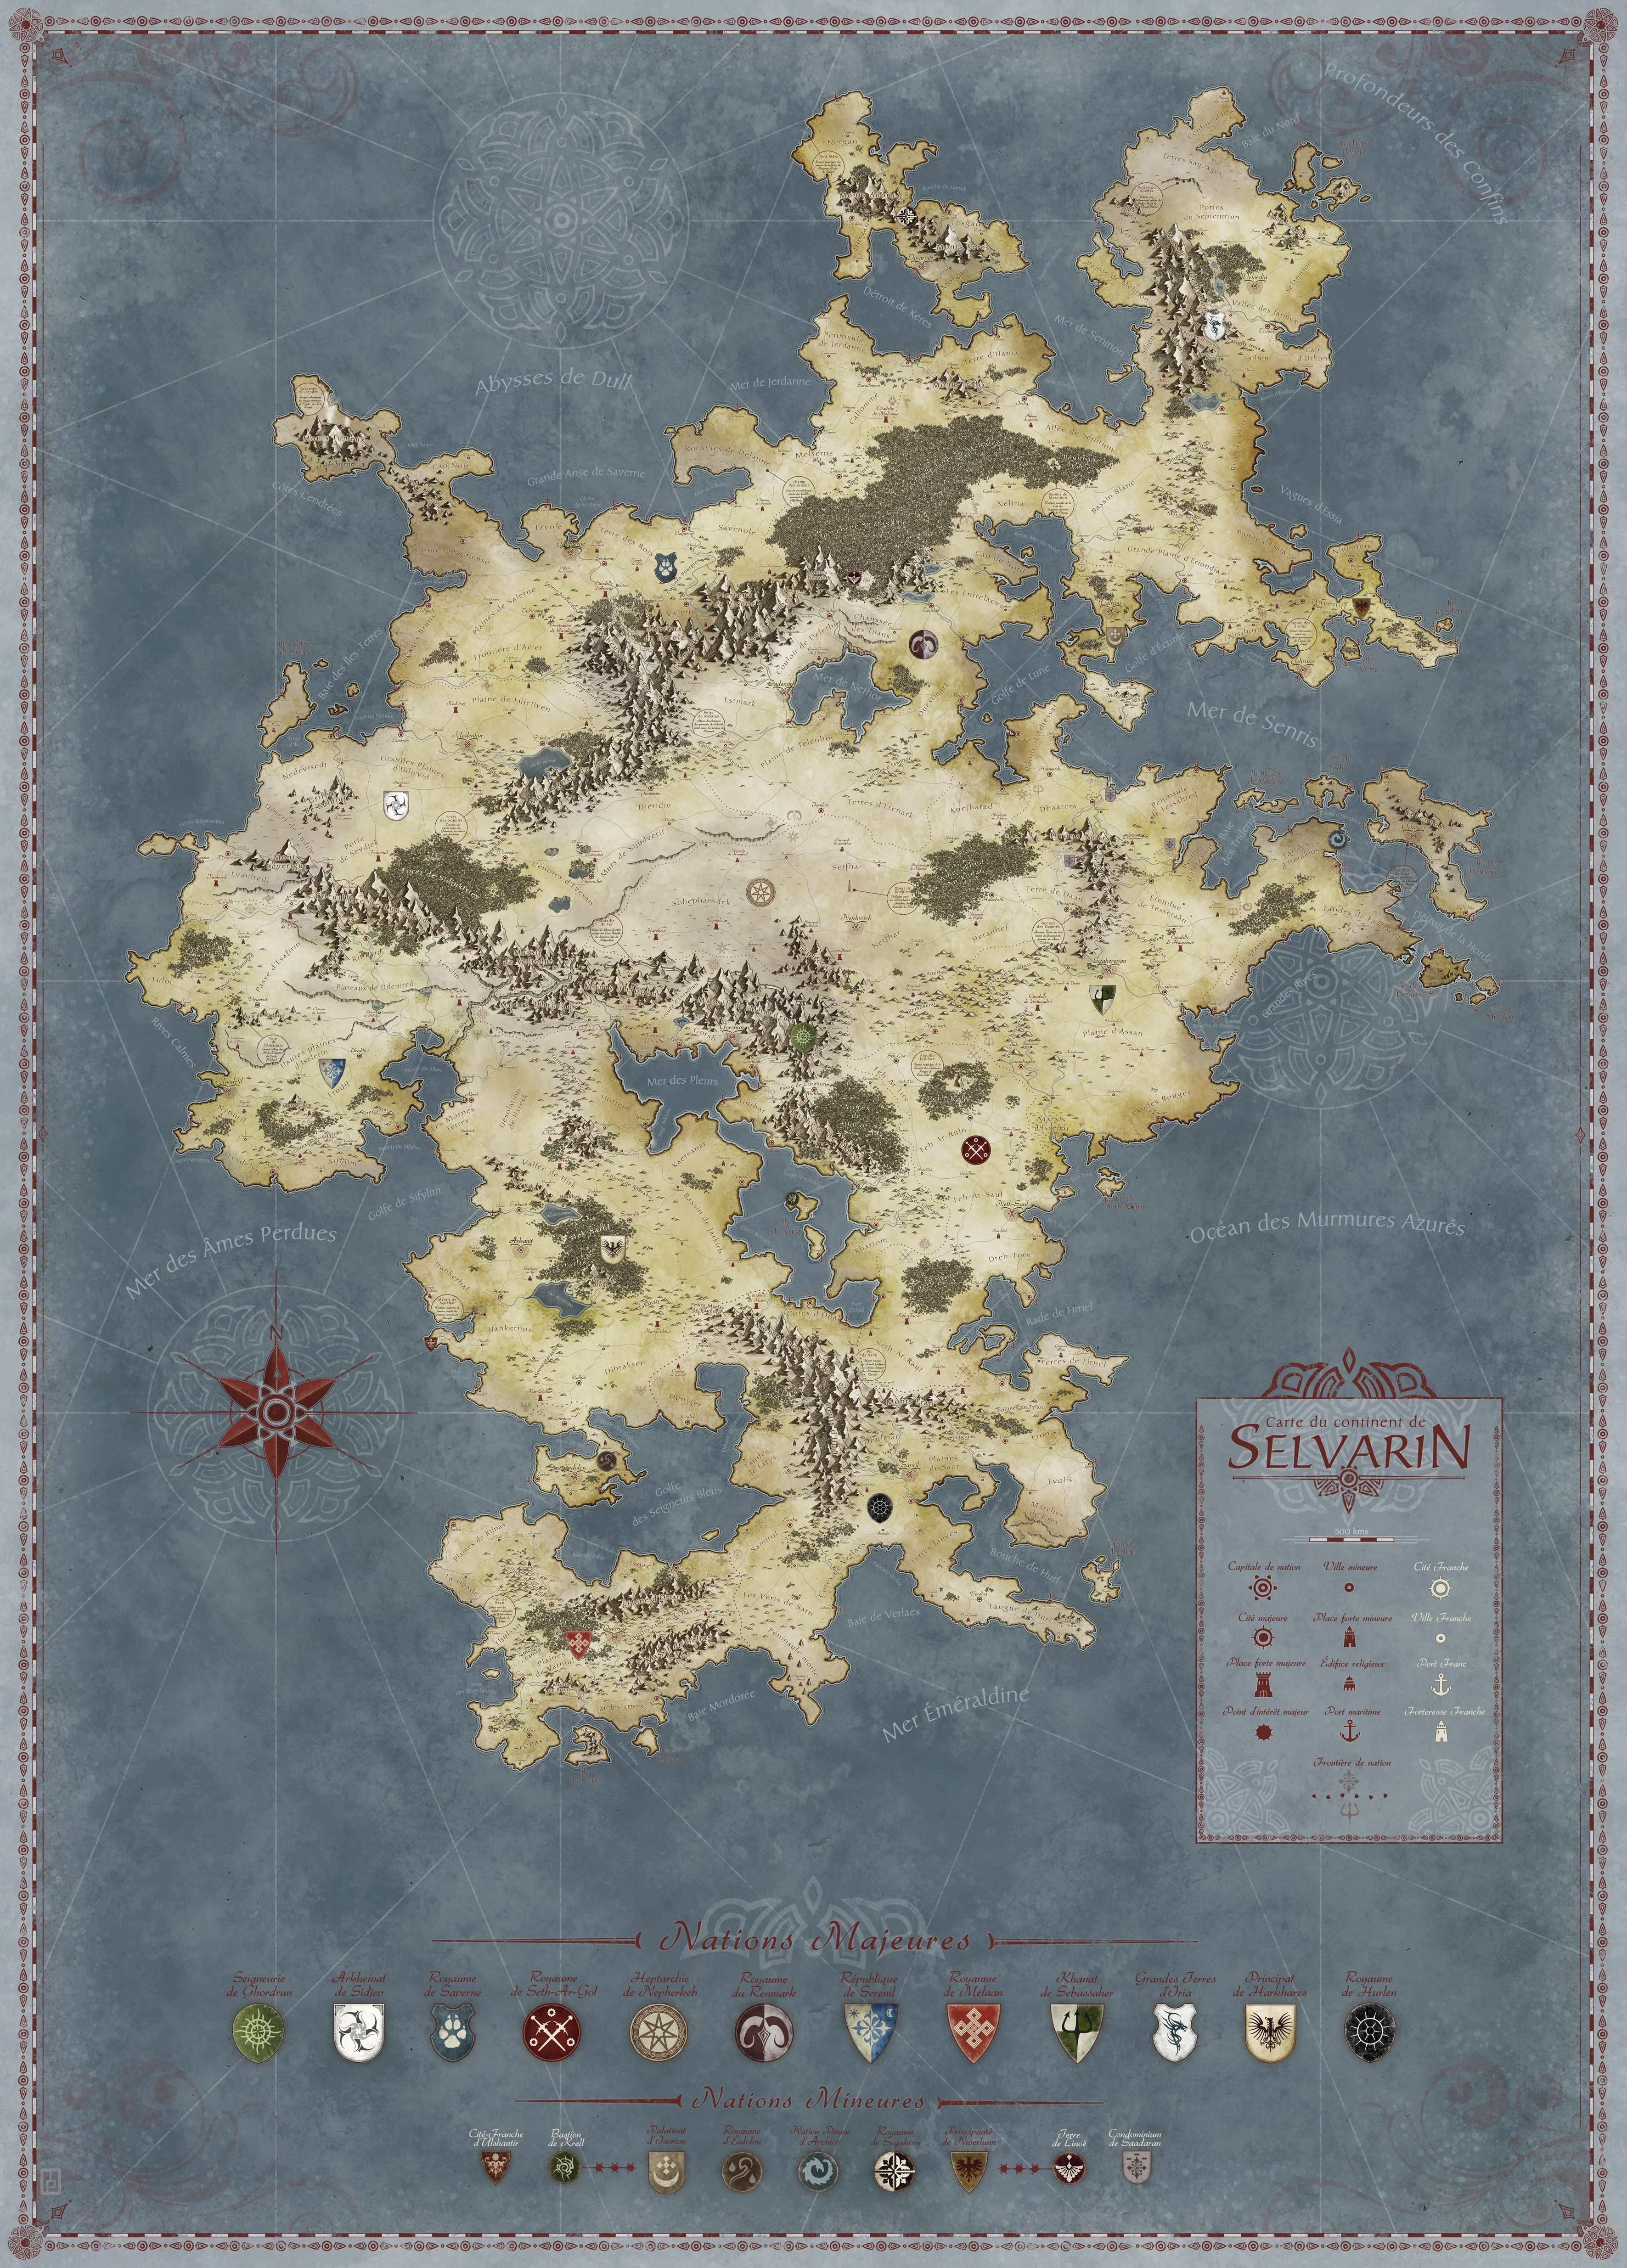 Pin by Glenn Wallace on RPG Maps